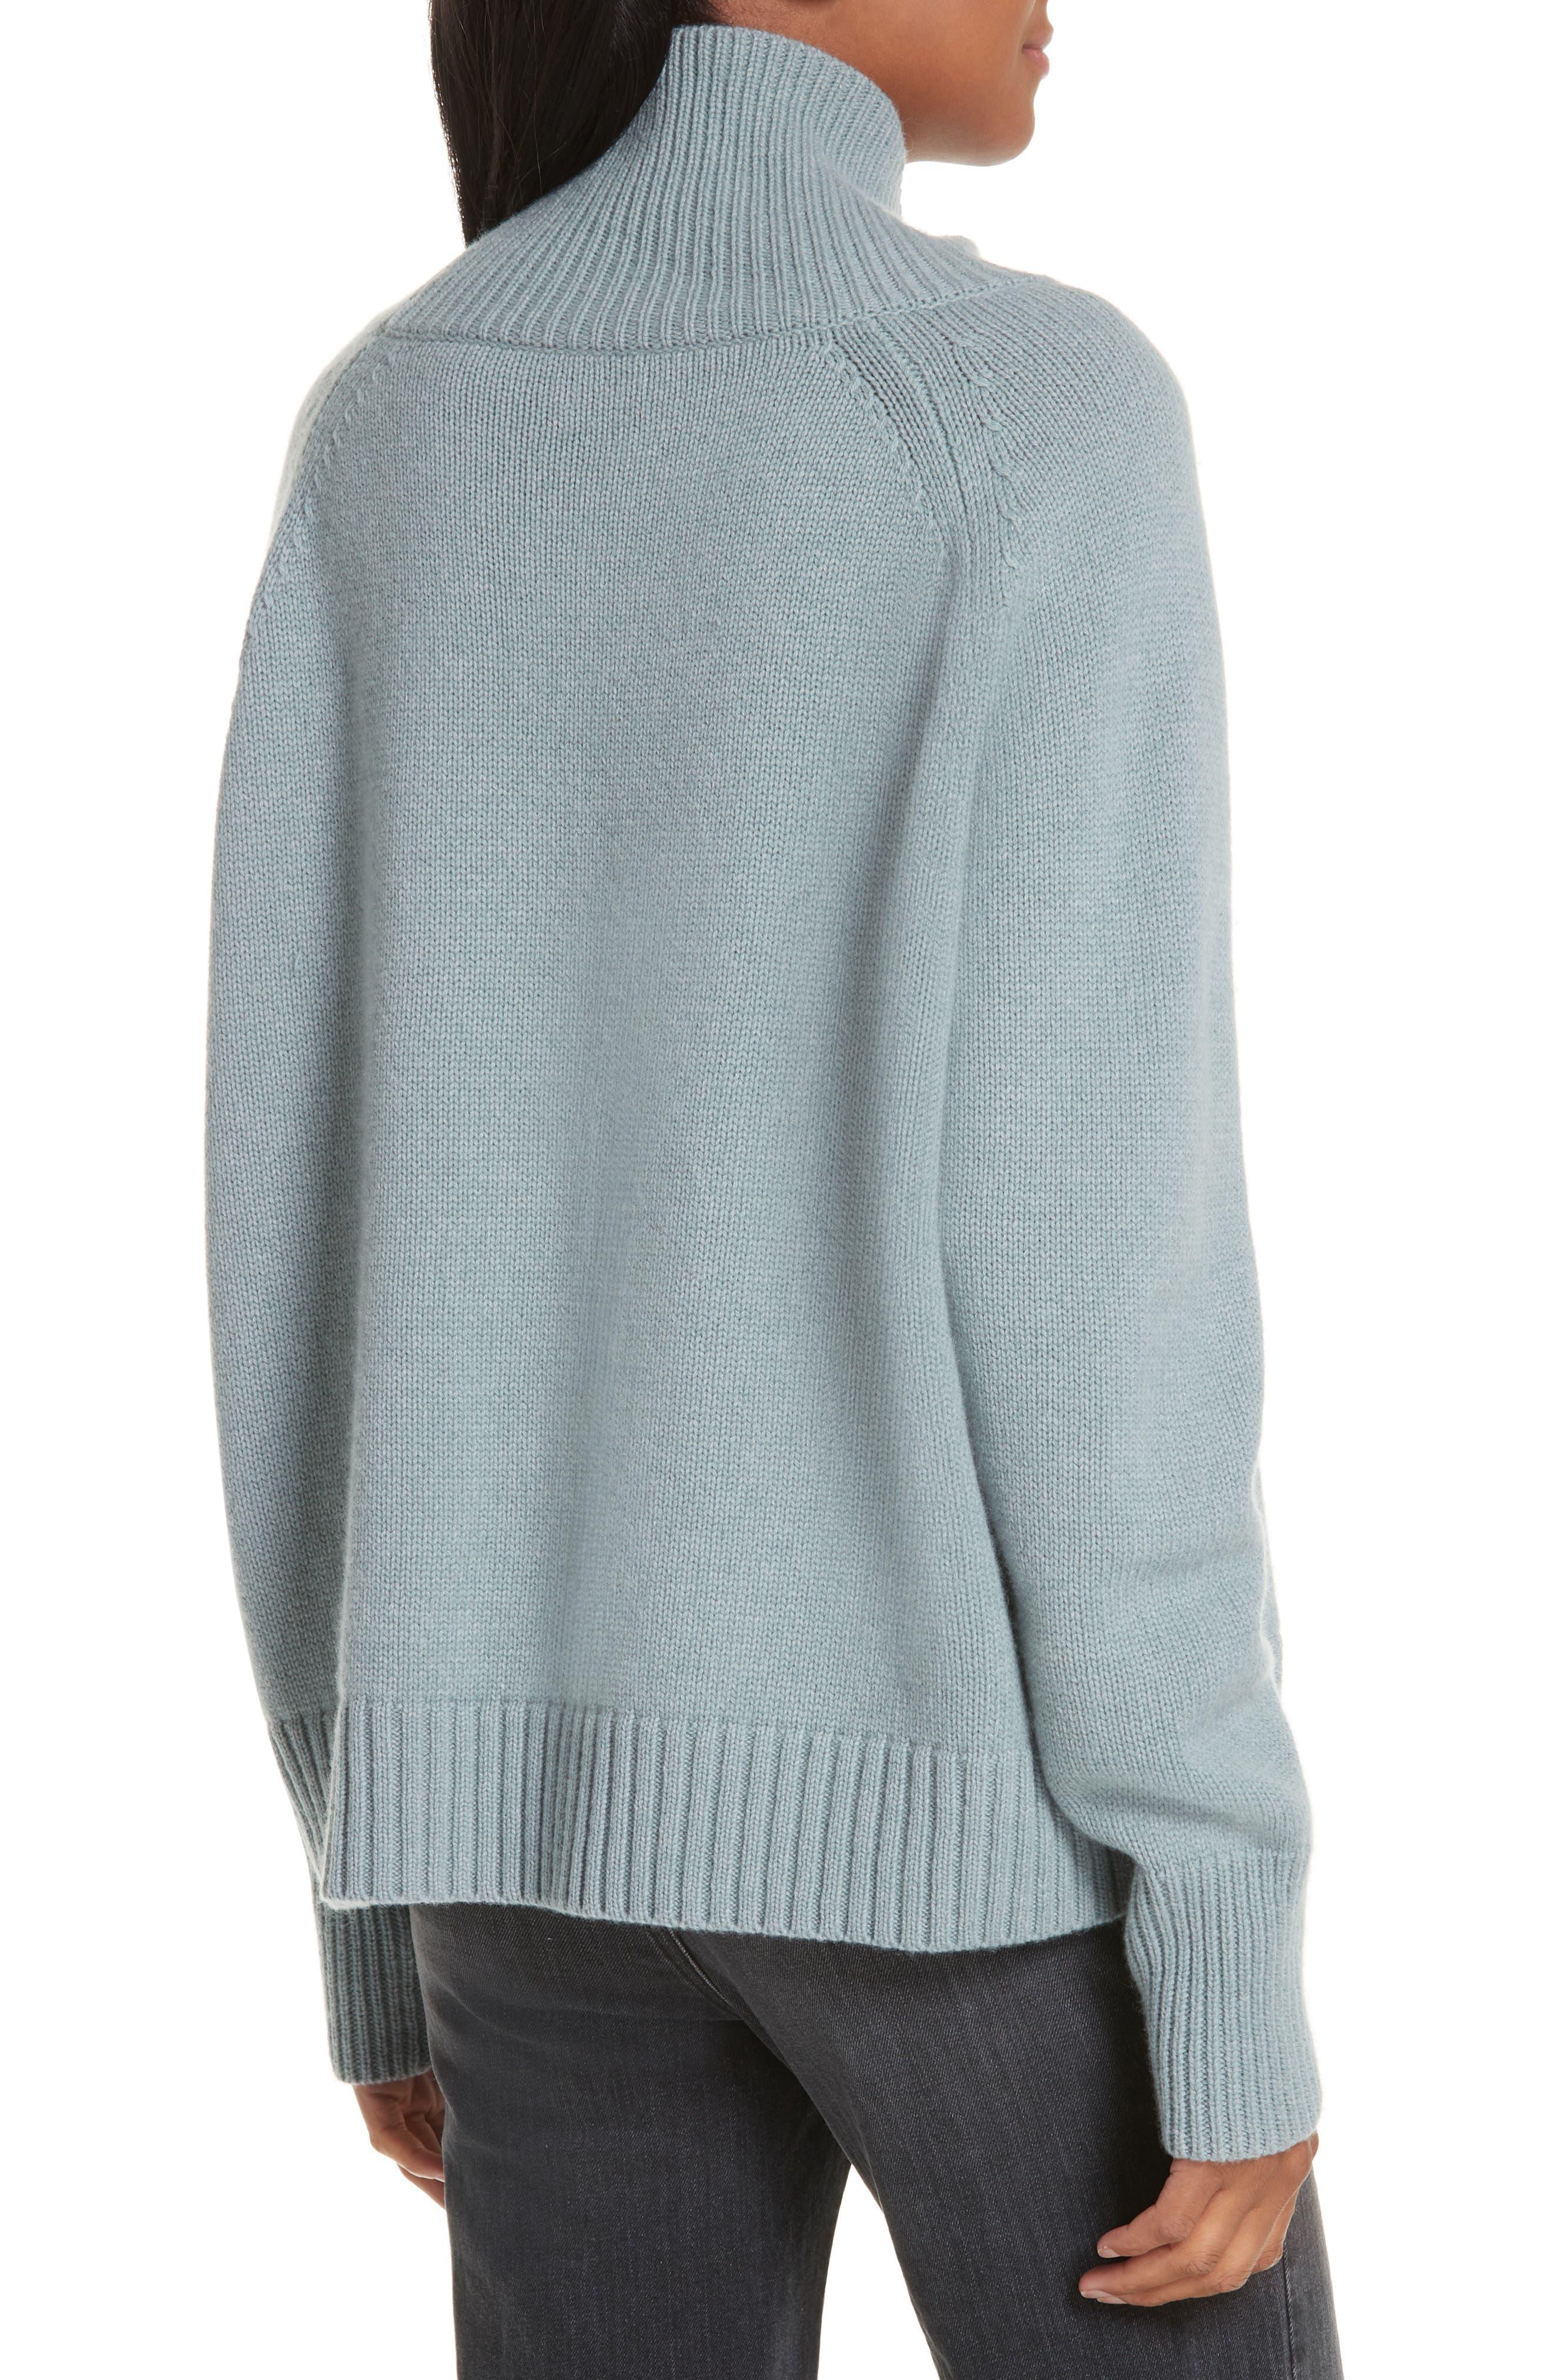 NILI LOTAN, Mariah Funnel Neck Cashmere Sweater, Alternate thumbnail 2, color, SKY BLUE